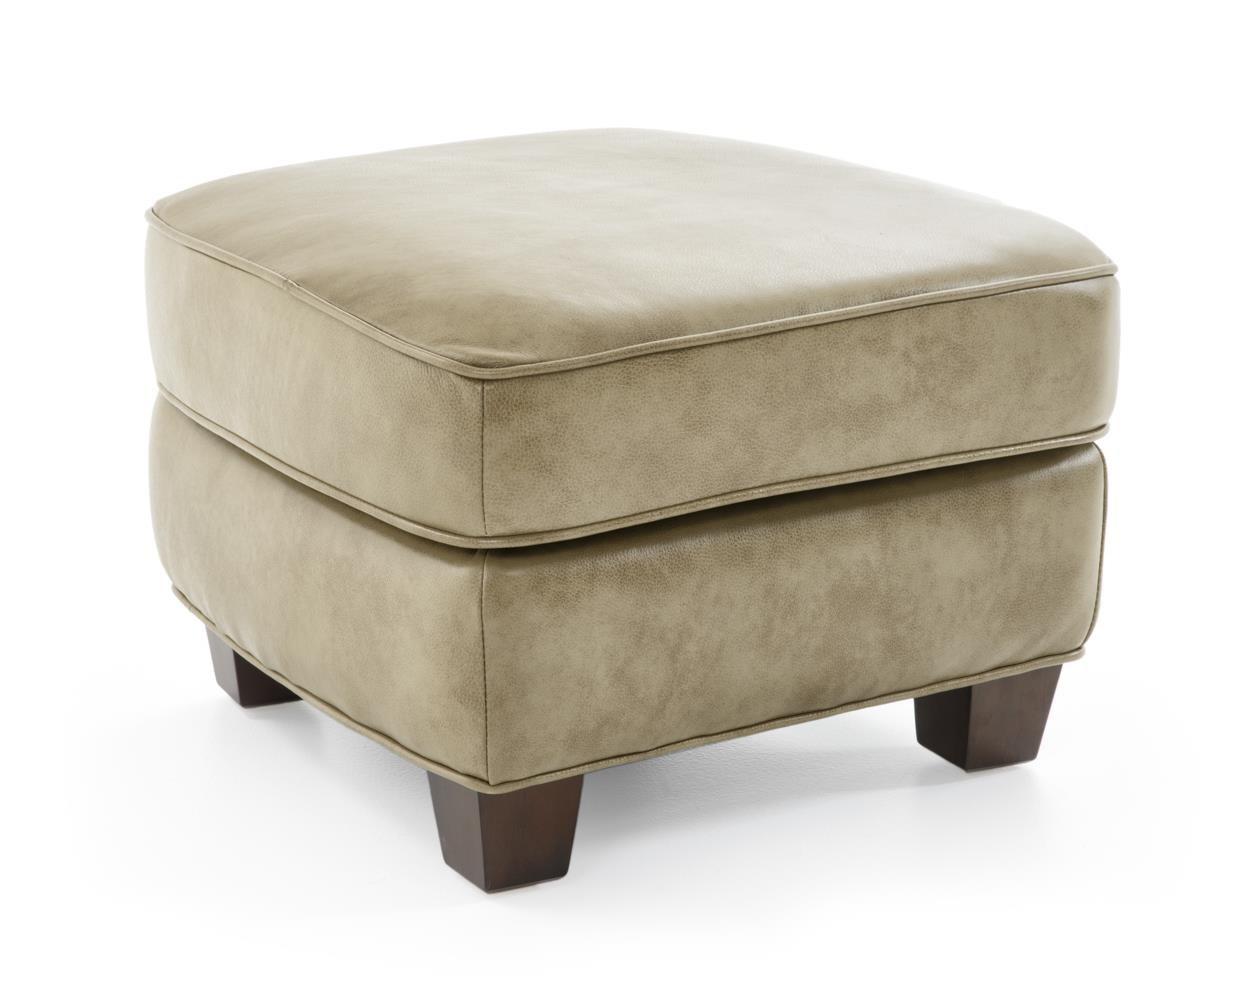 Futura Leather 6307 Storage Ottoman - Item Number: 6307-63 1420F SANIBEL